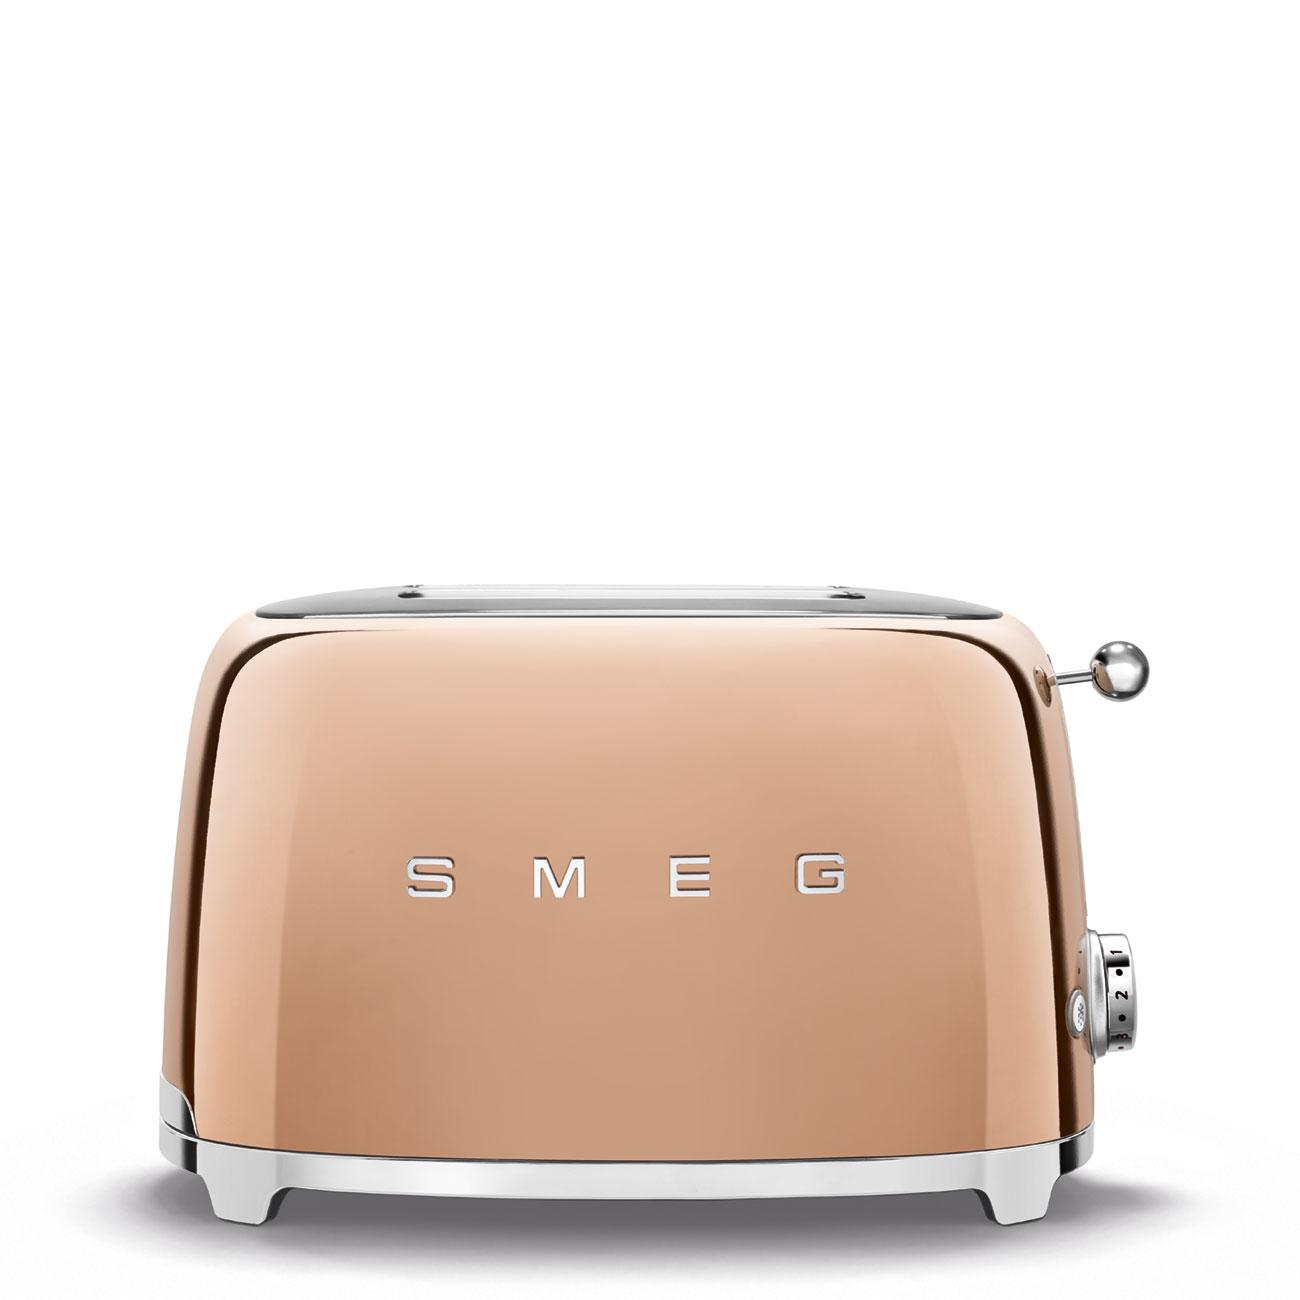 toasters cuivre Smeg